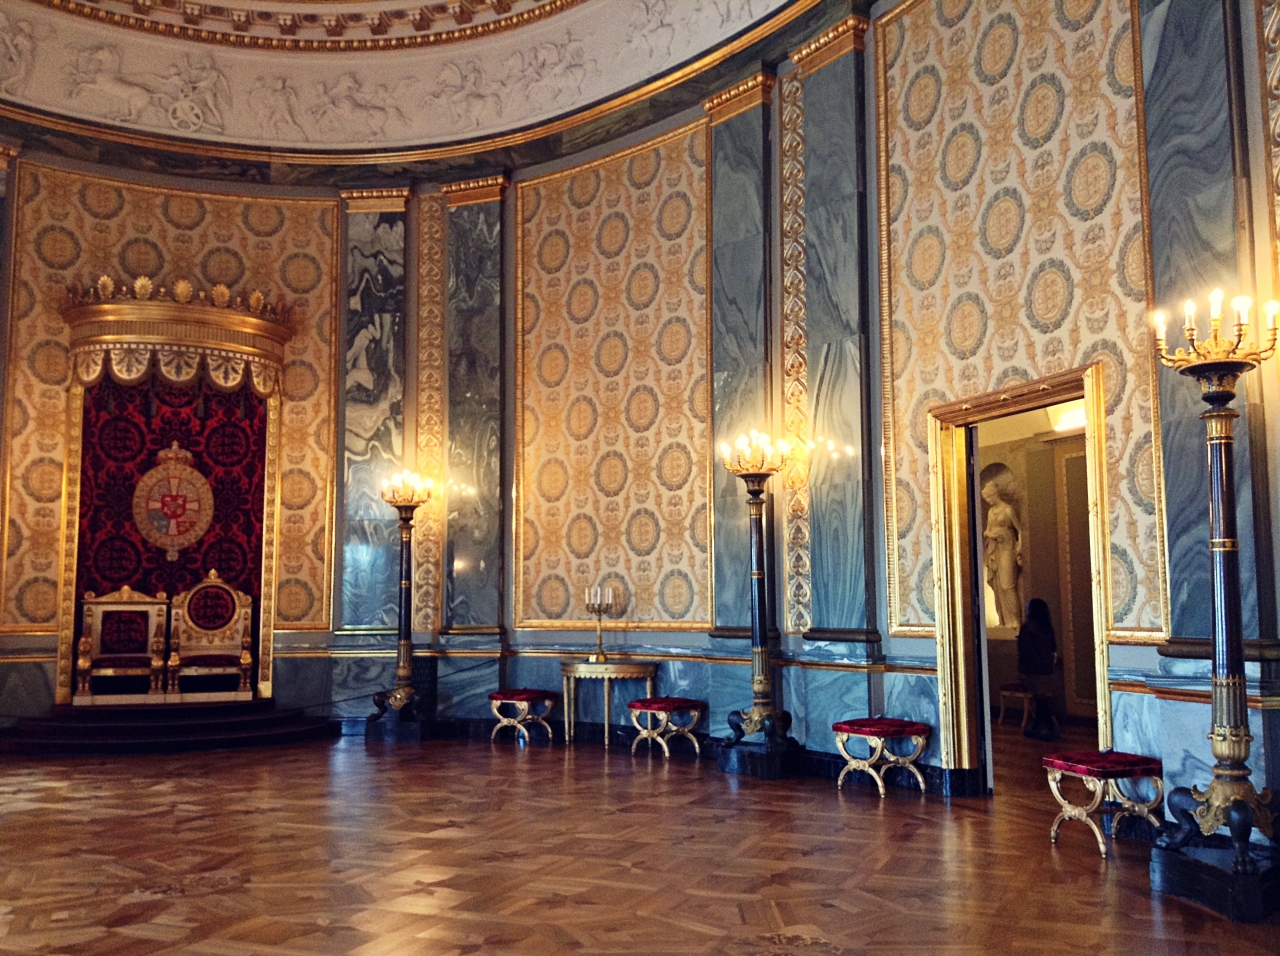 Throne Room Christianborg Palace